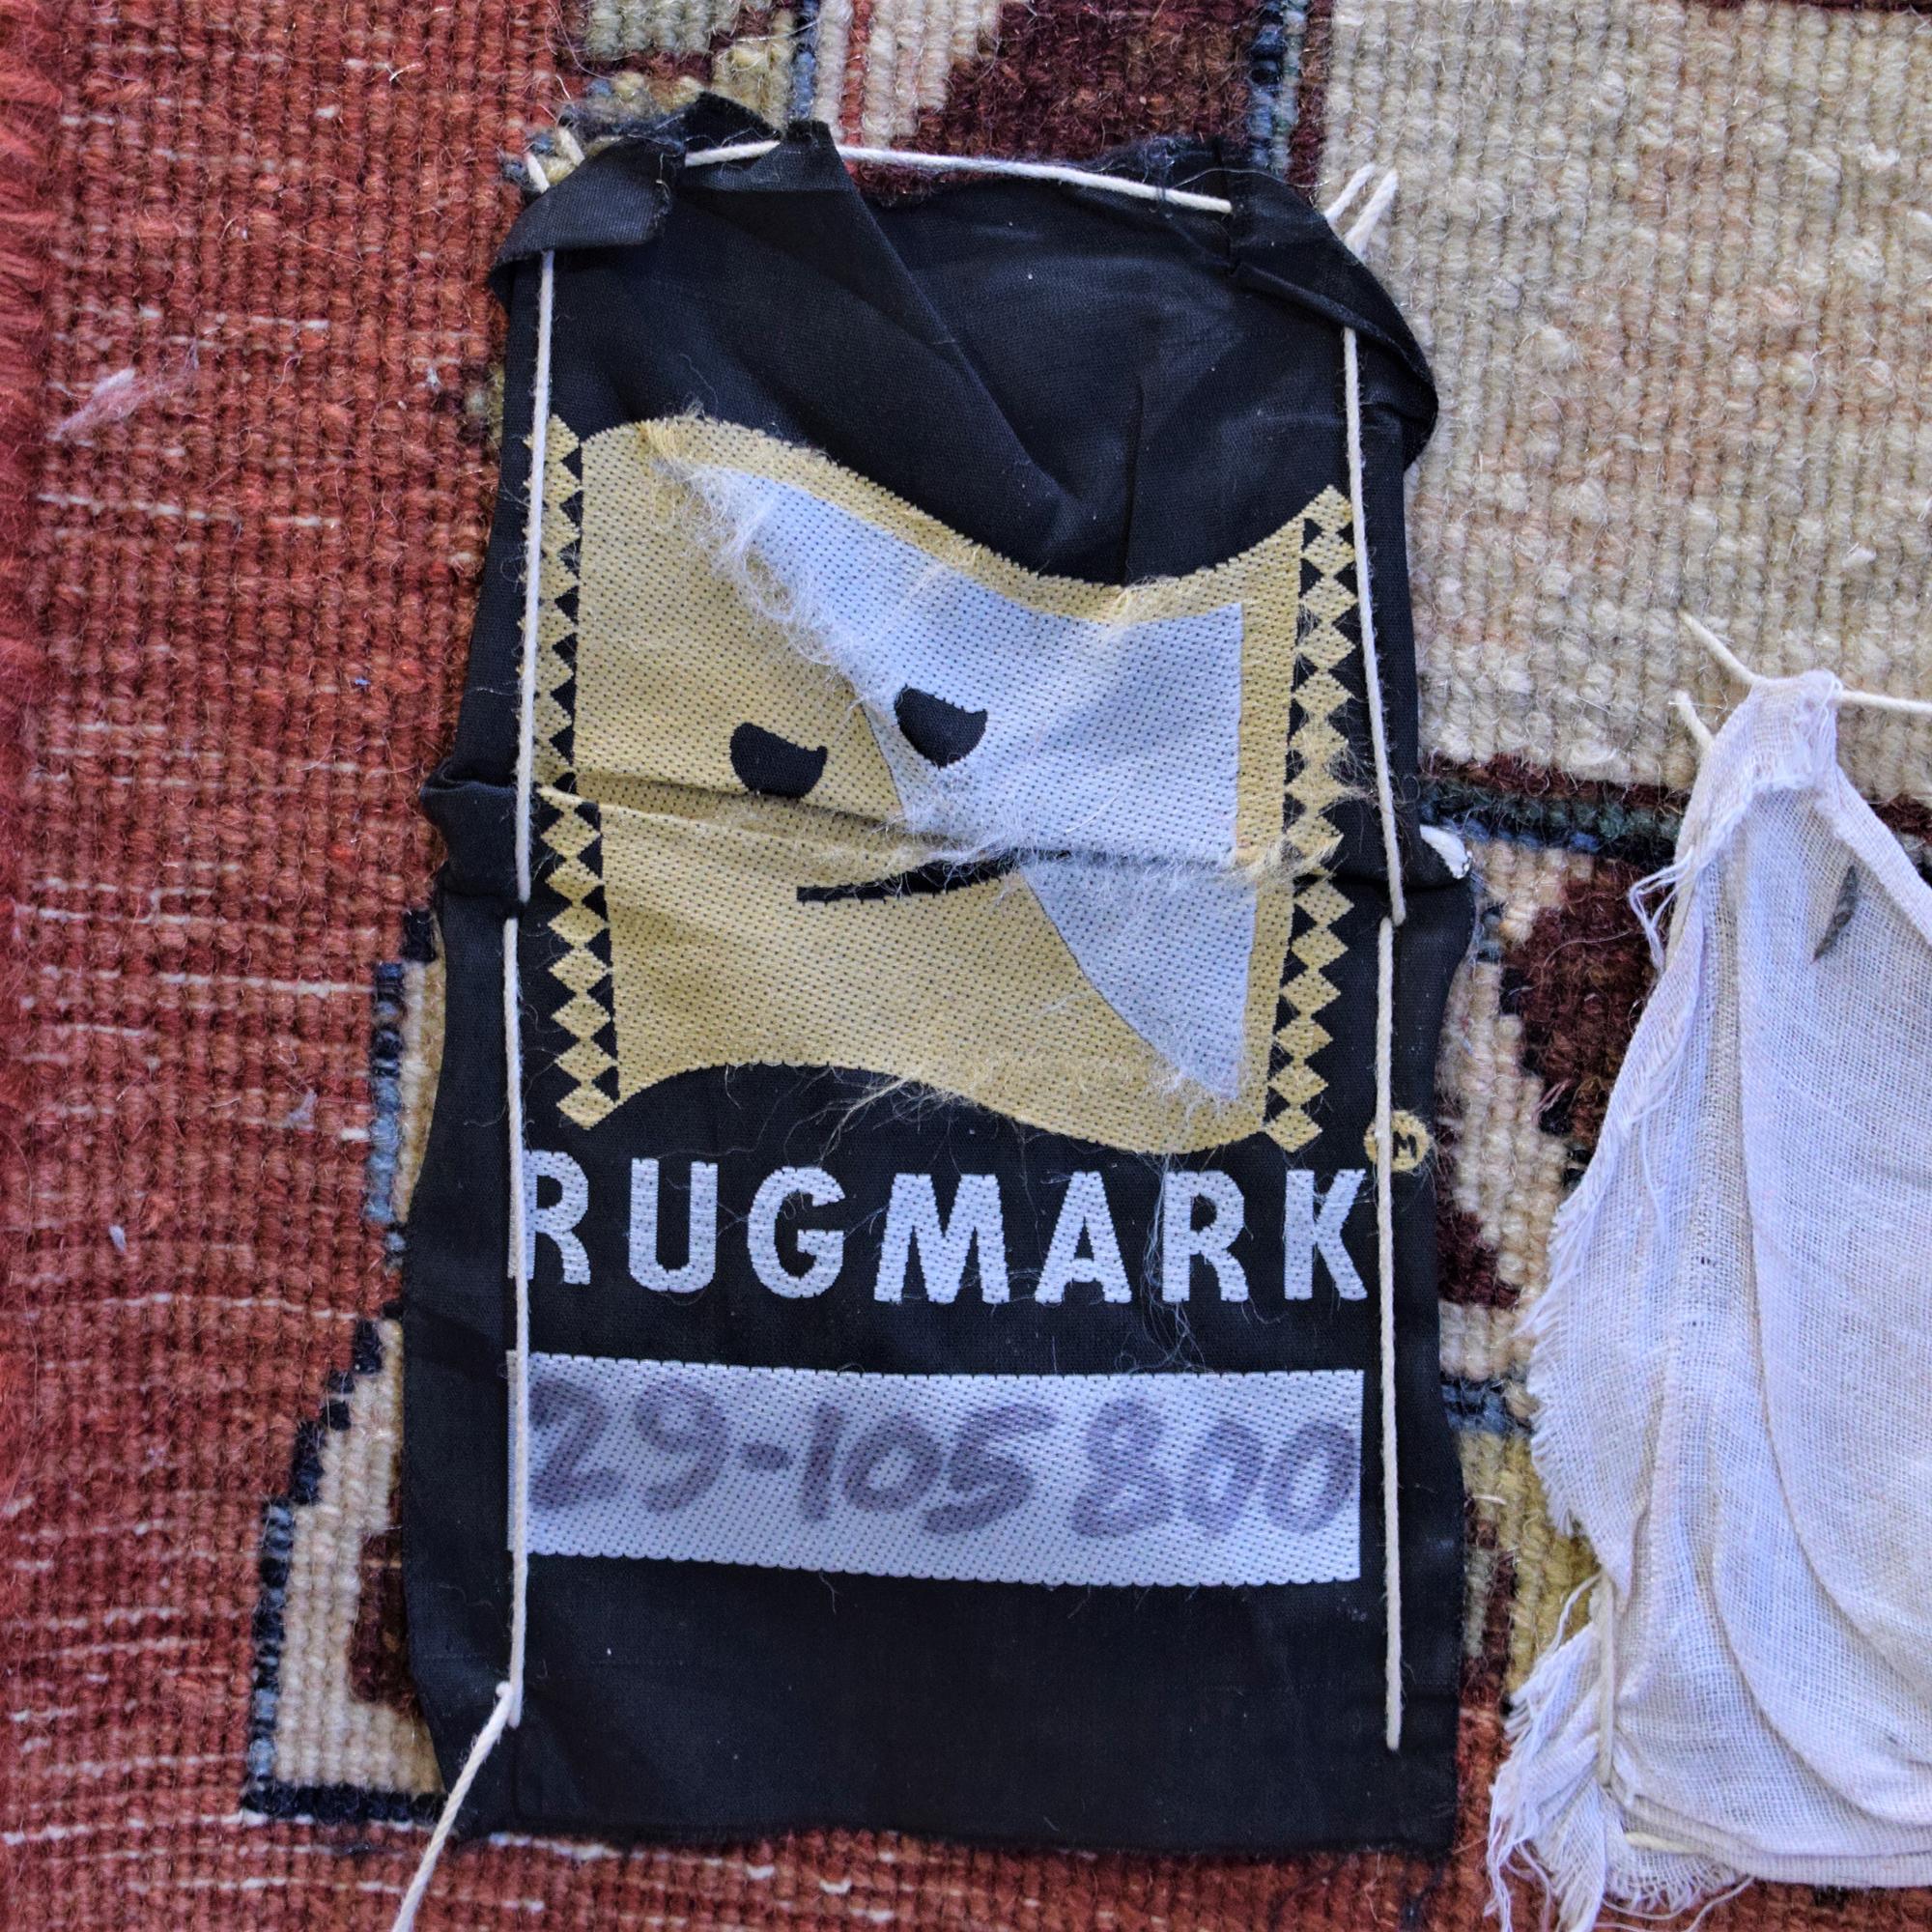 Rugmark Rug / Decor